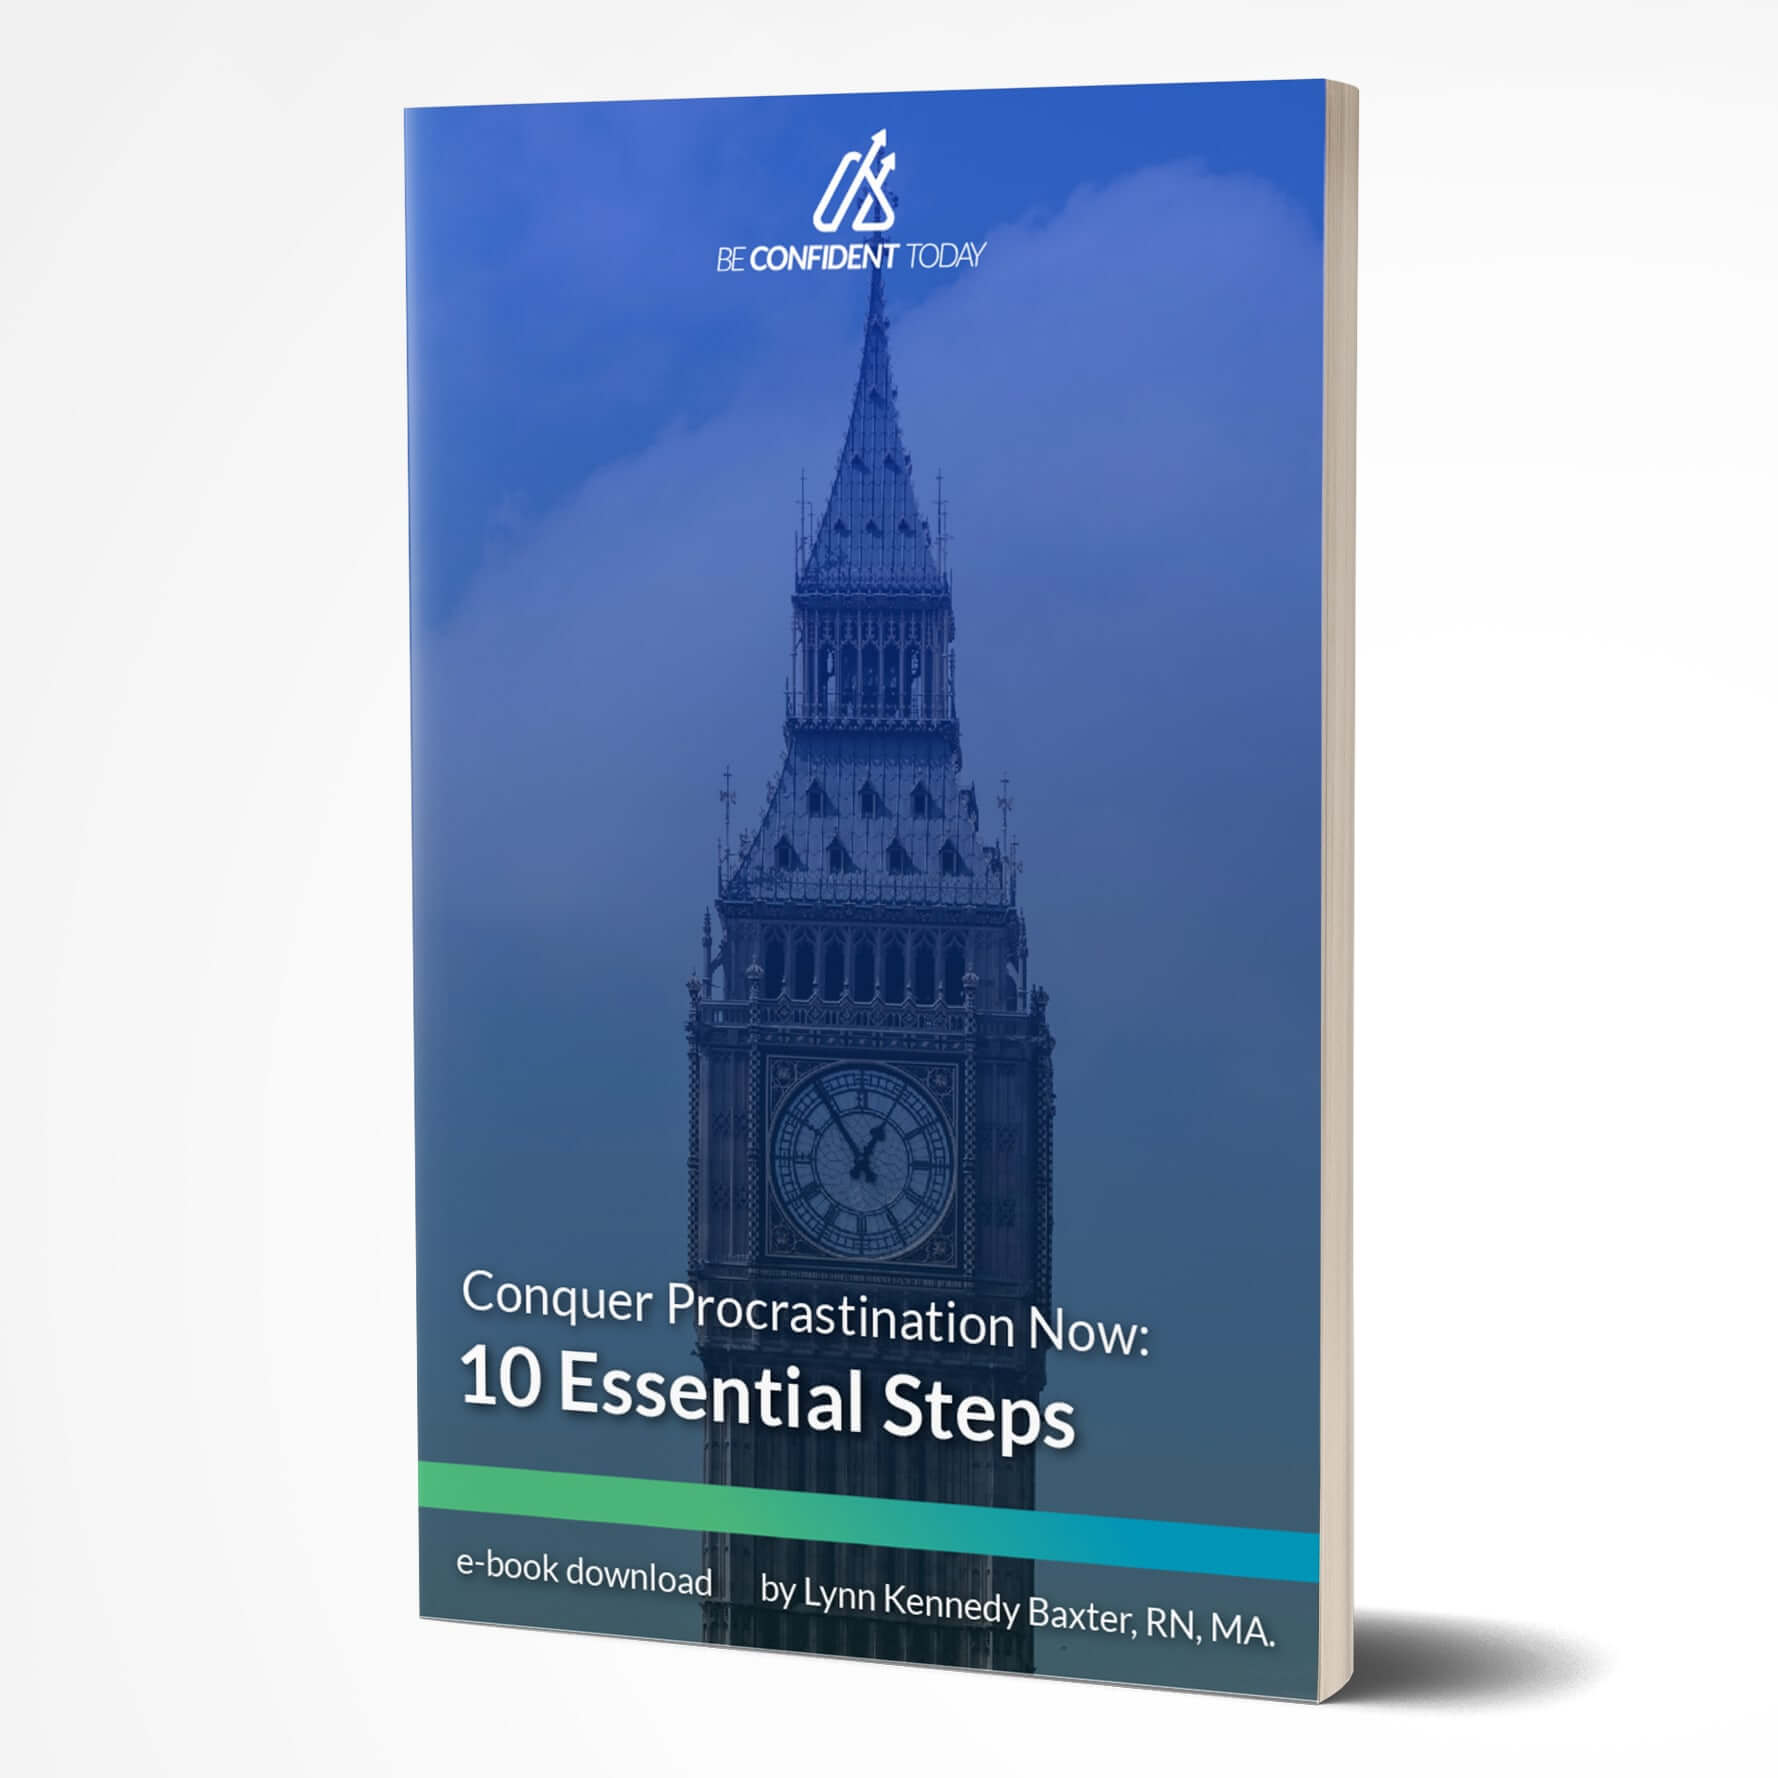 conquer-procrastination-ebook